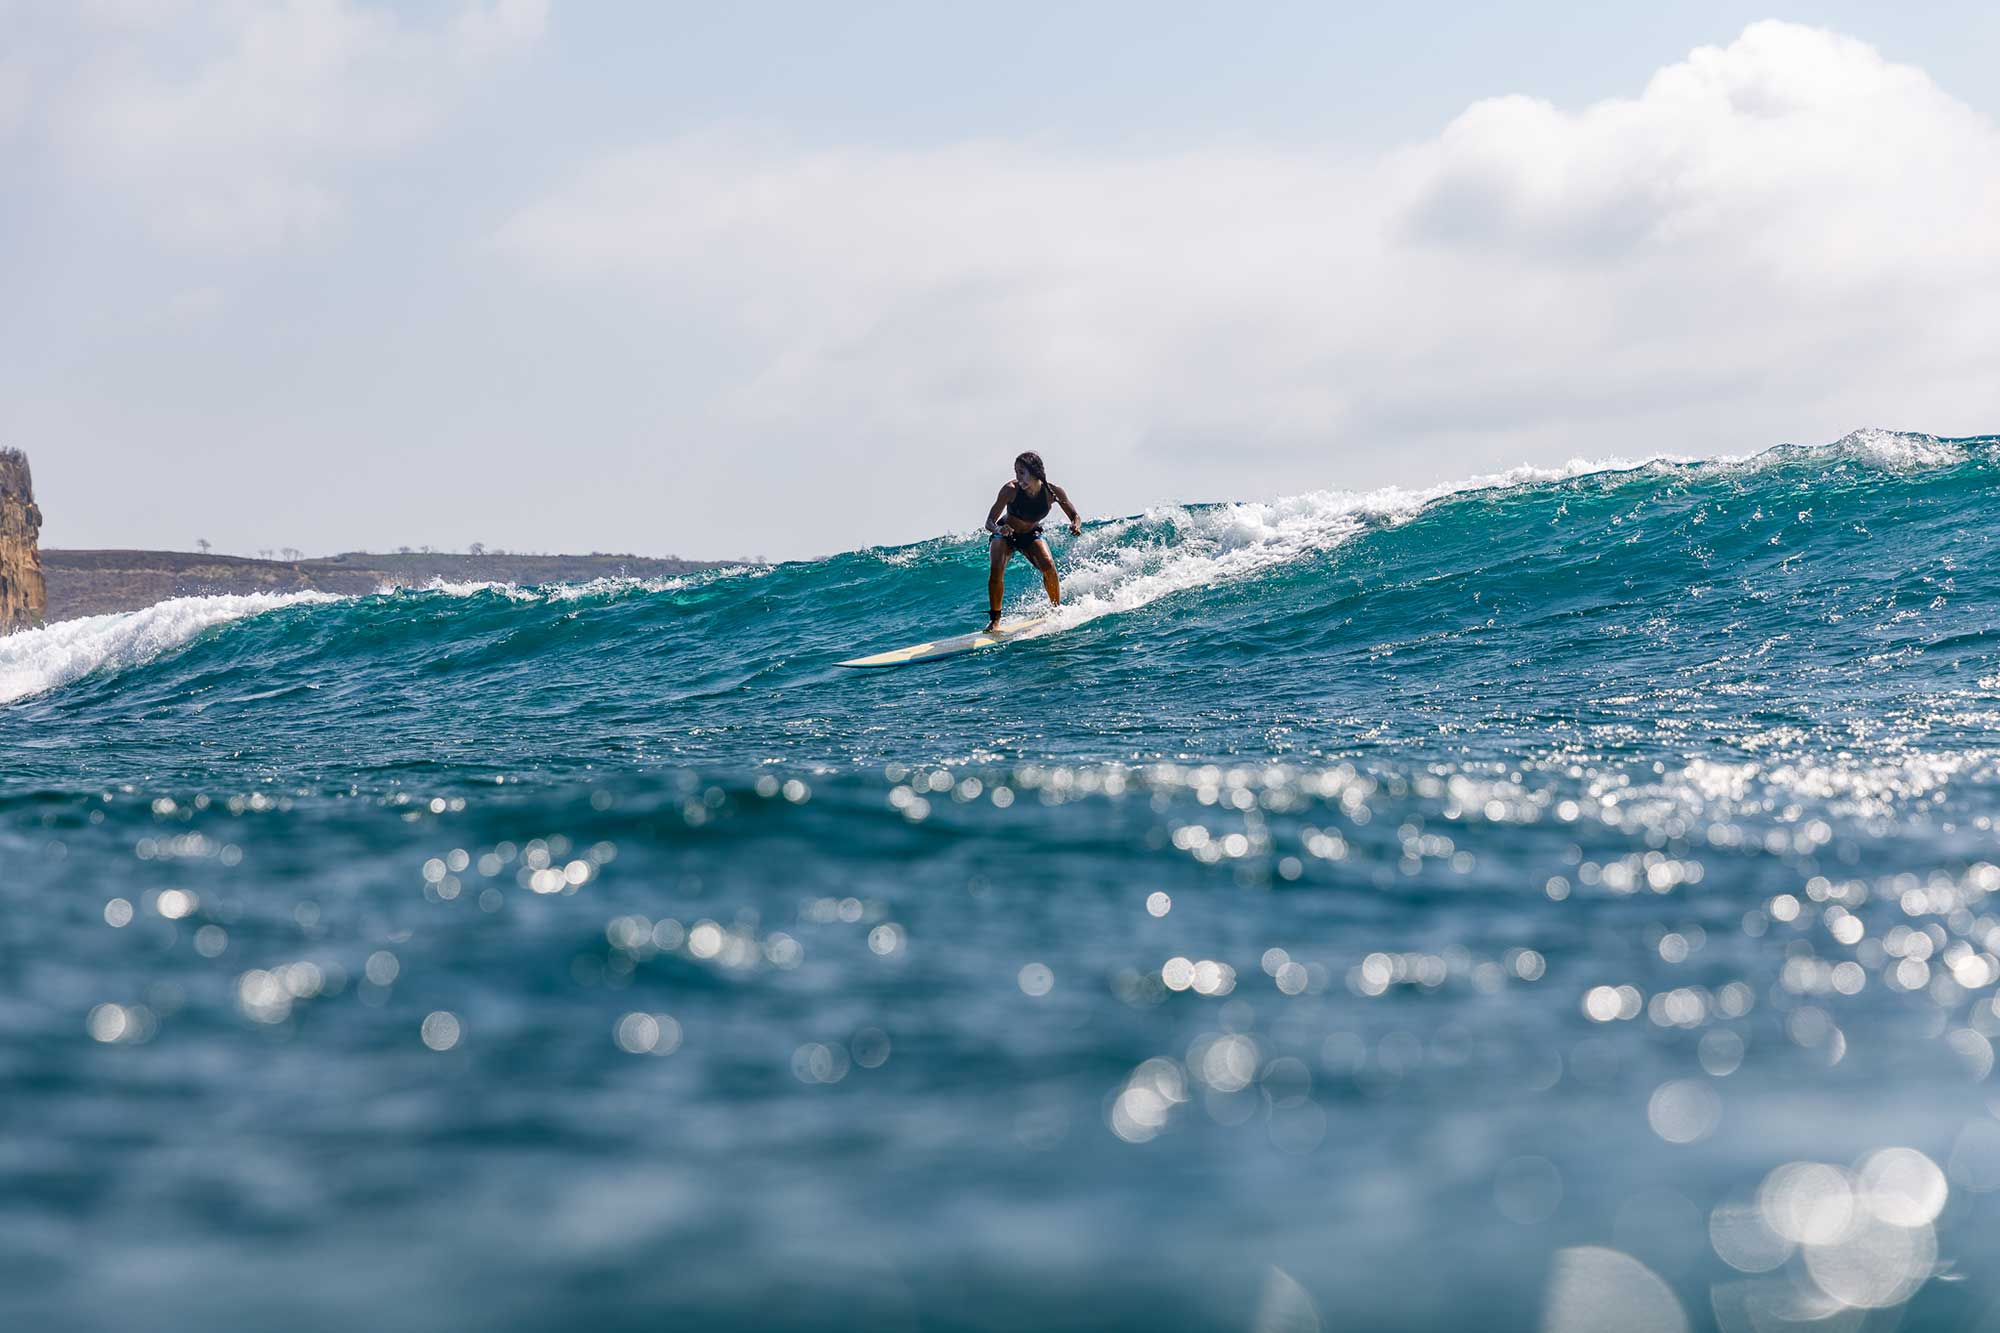 https://www.soulandsurf.com/wp-content/uploads/2021/08/lombok-pop-up-2019-Copy-of-Lombok-pop-up-@peterchamberlainphotoI11A1001.jpg Image